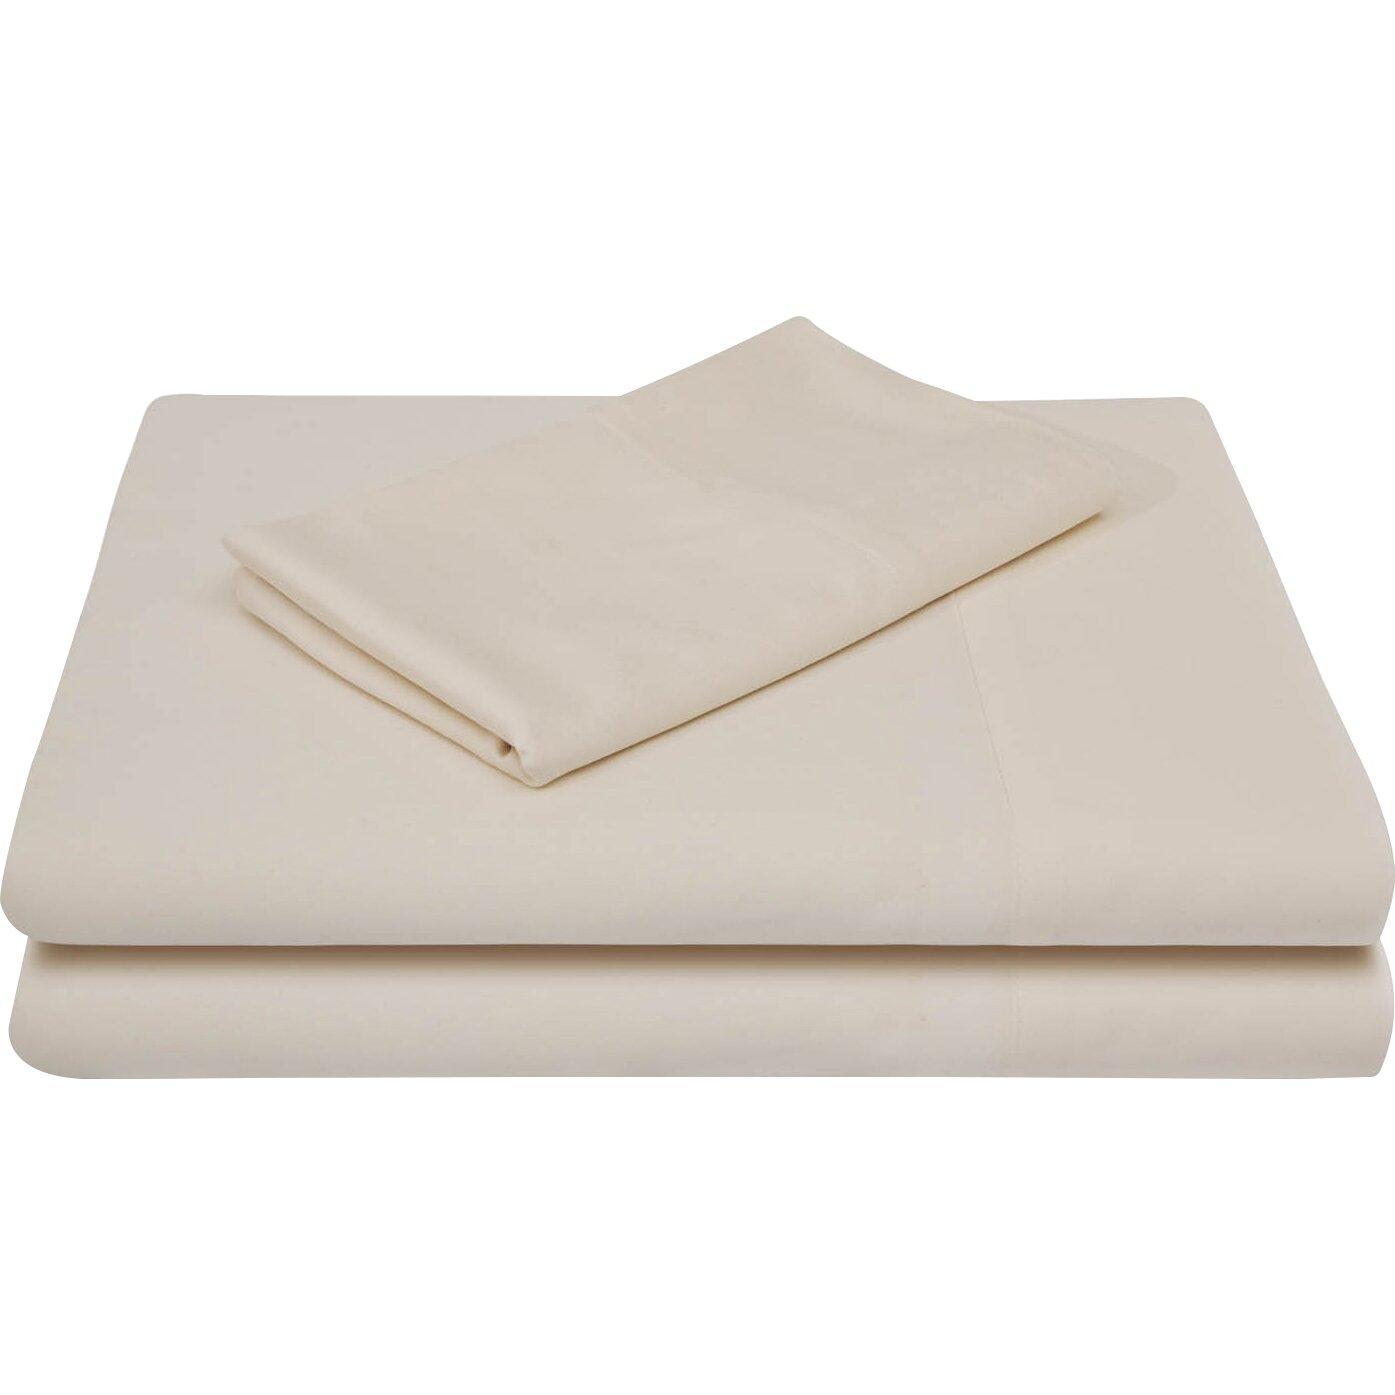 Malouf Bamboo Rayon Bed Sheet Set Amp Reviews Wayfair